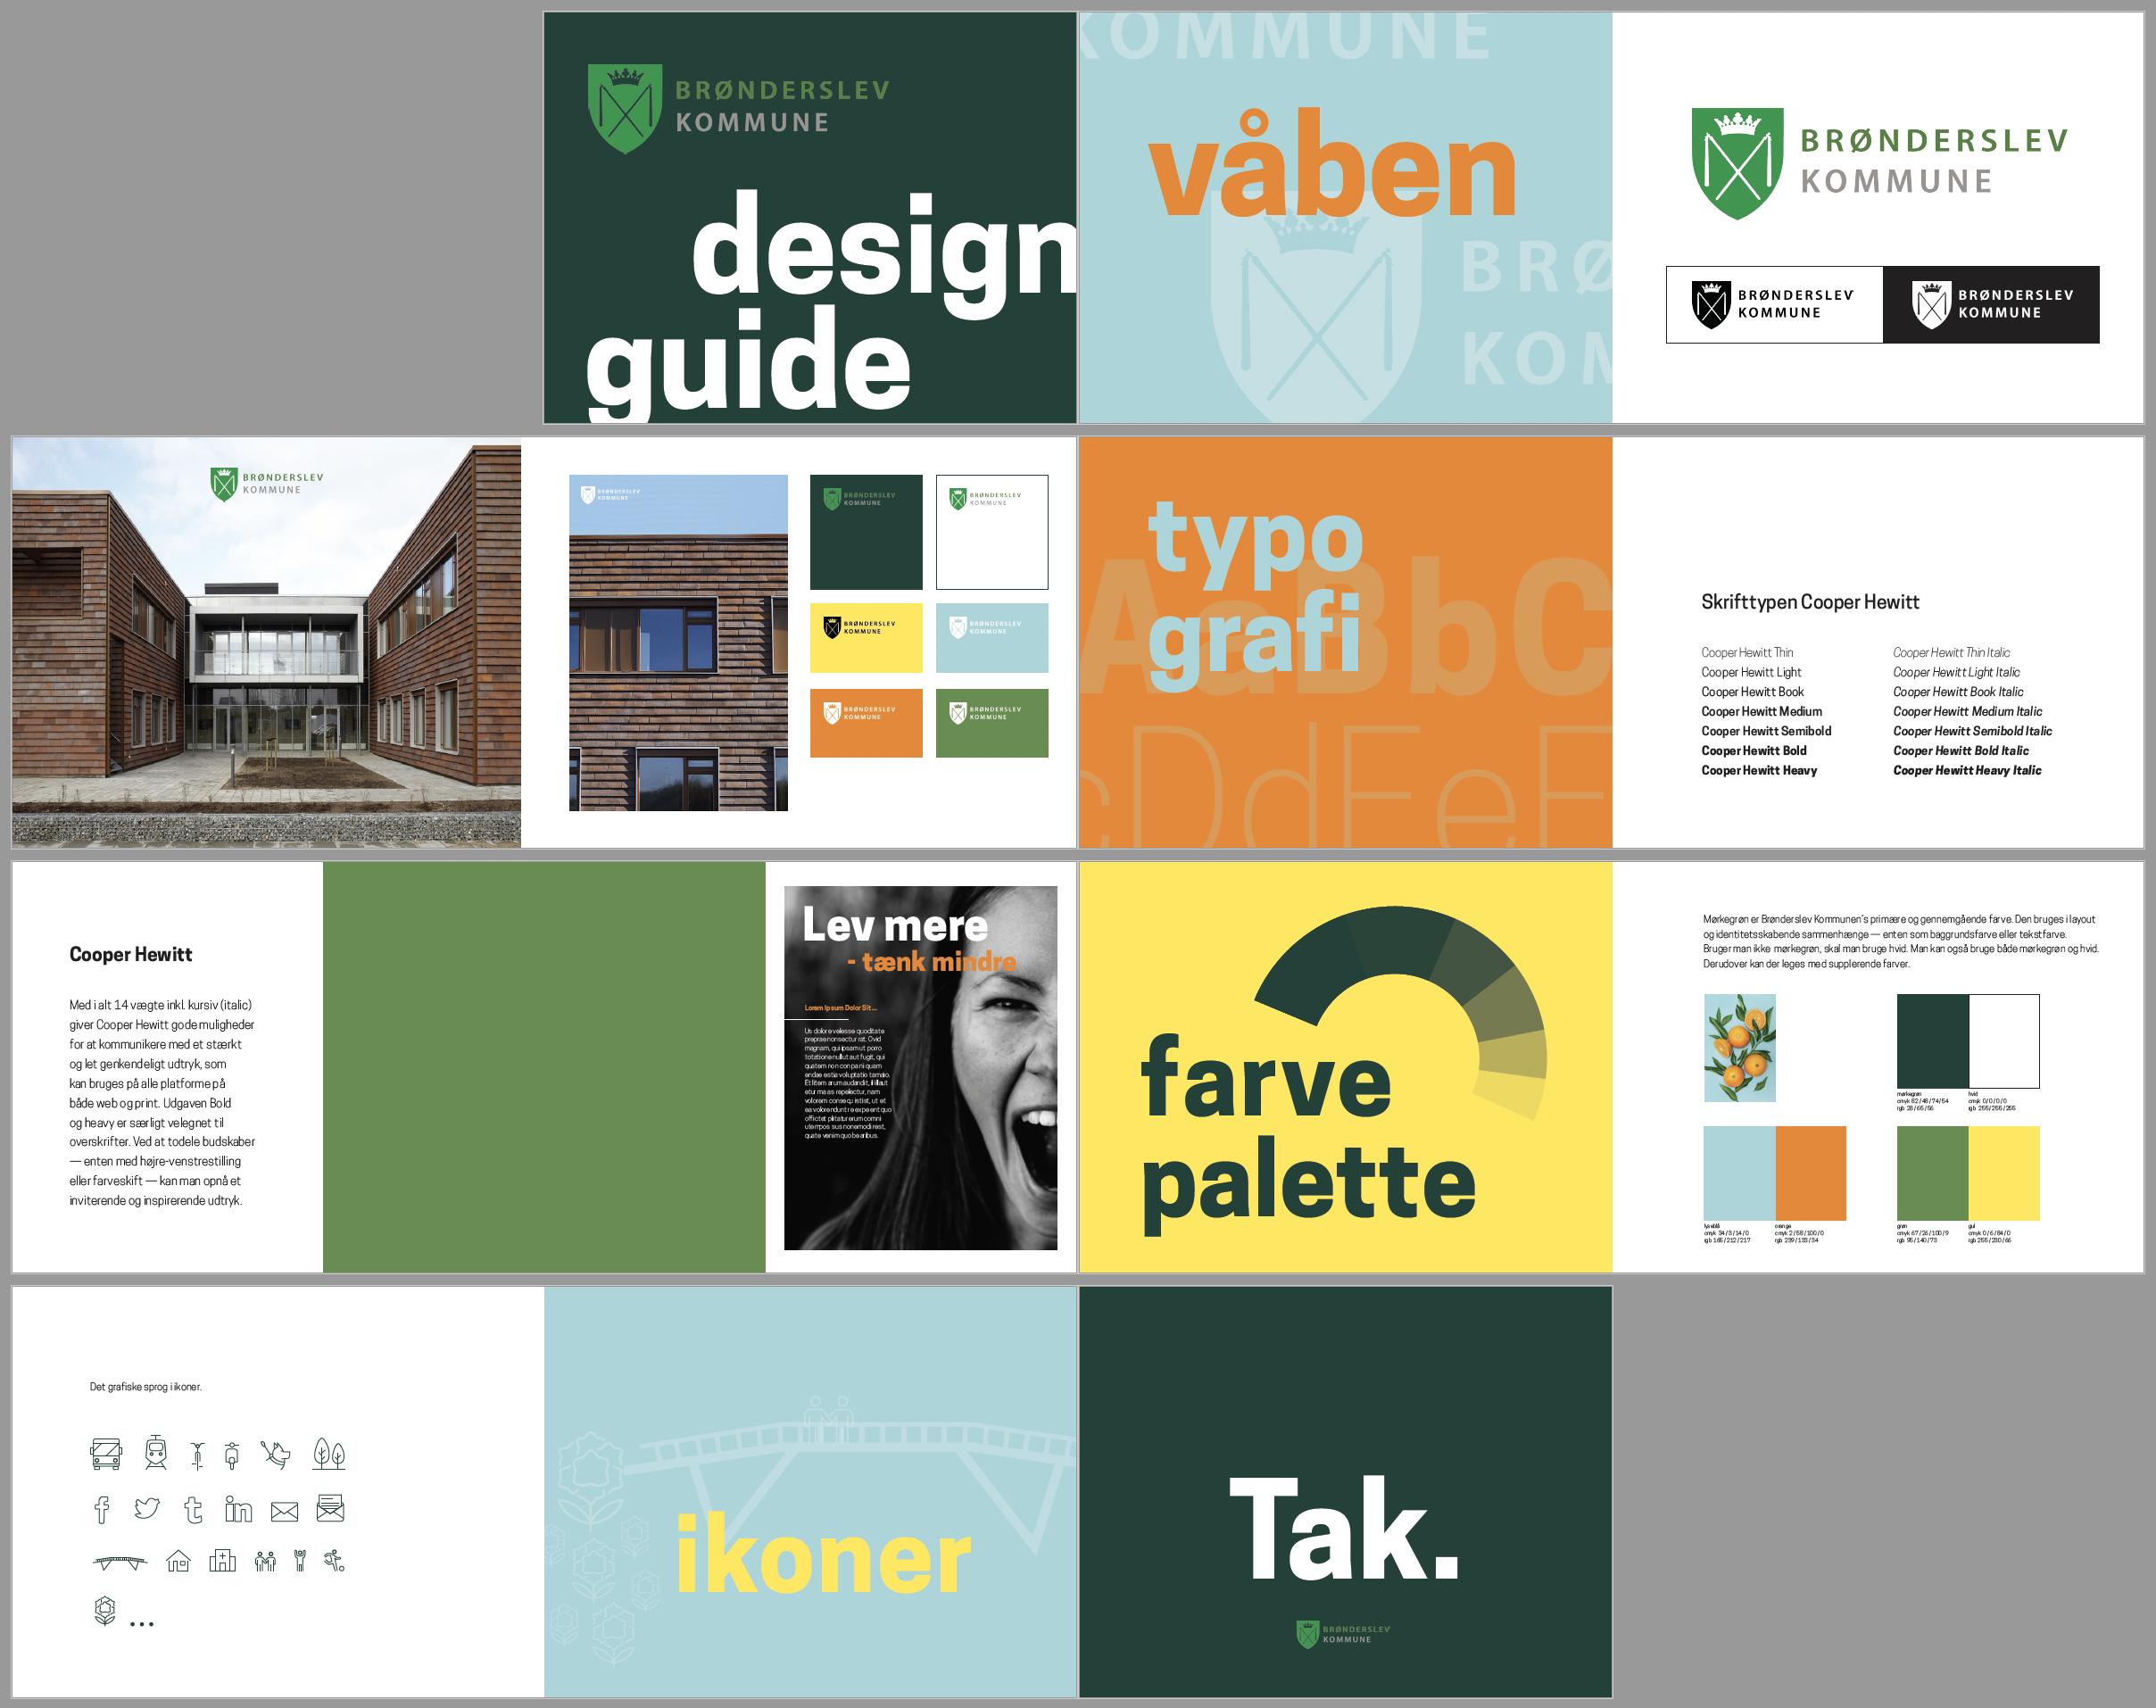 Ny Designlinje til Brønderslev Kommune